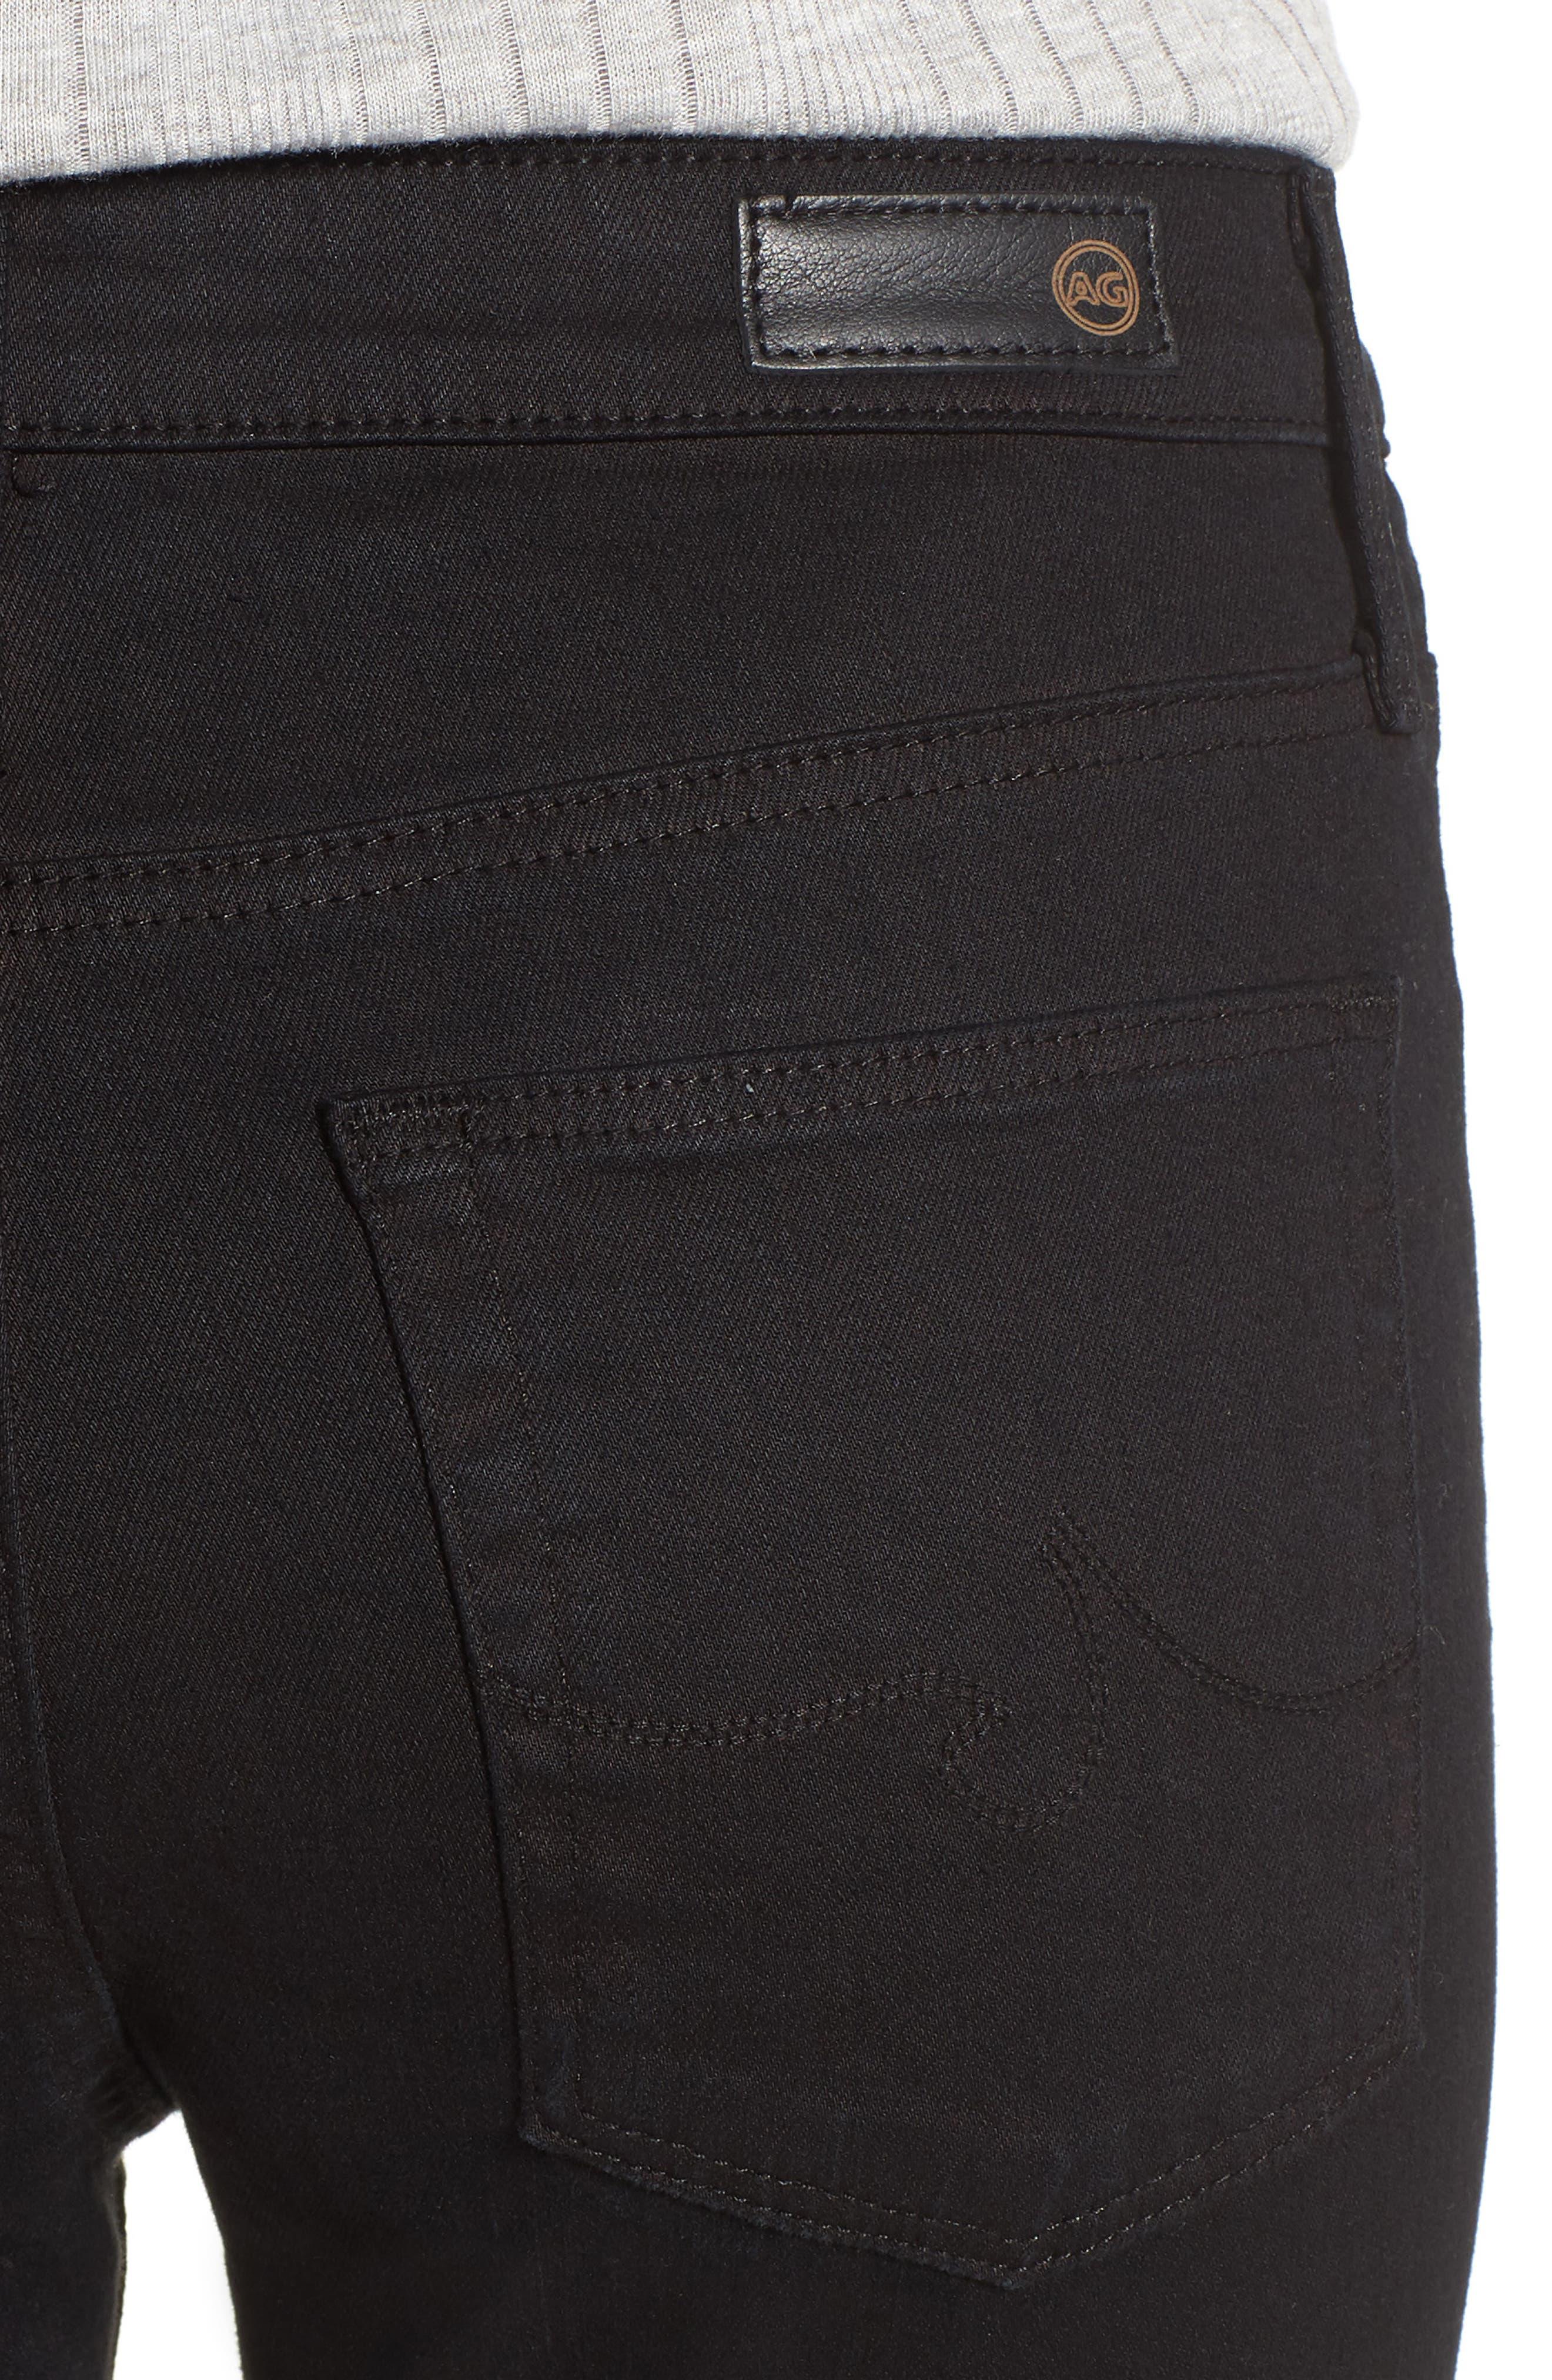 'The Farrah' High Rise Skinny Jeans,                             Alternate thumbnail 4, color,                             Overdyed Black